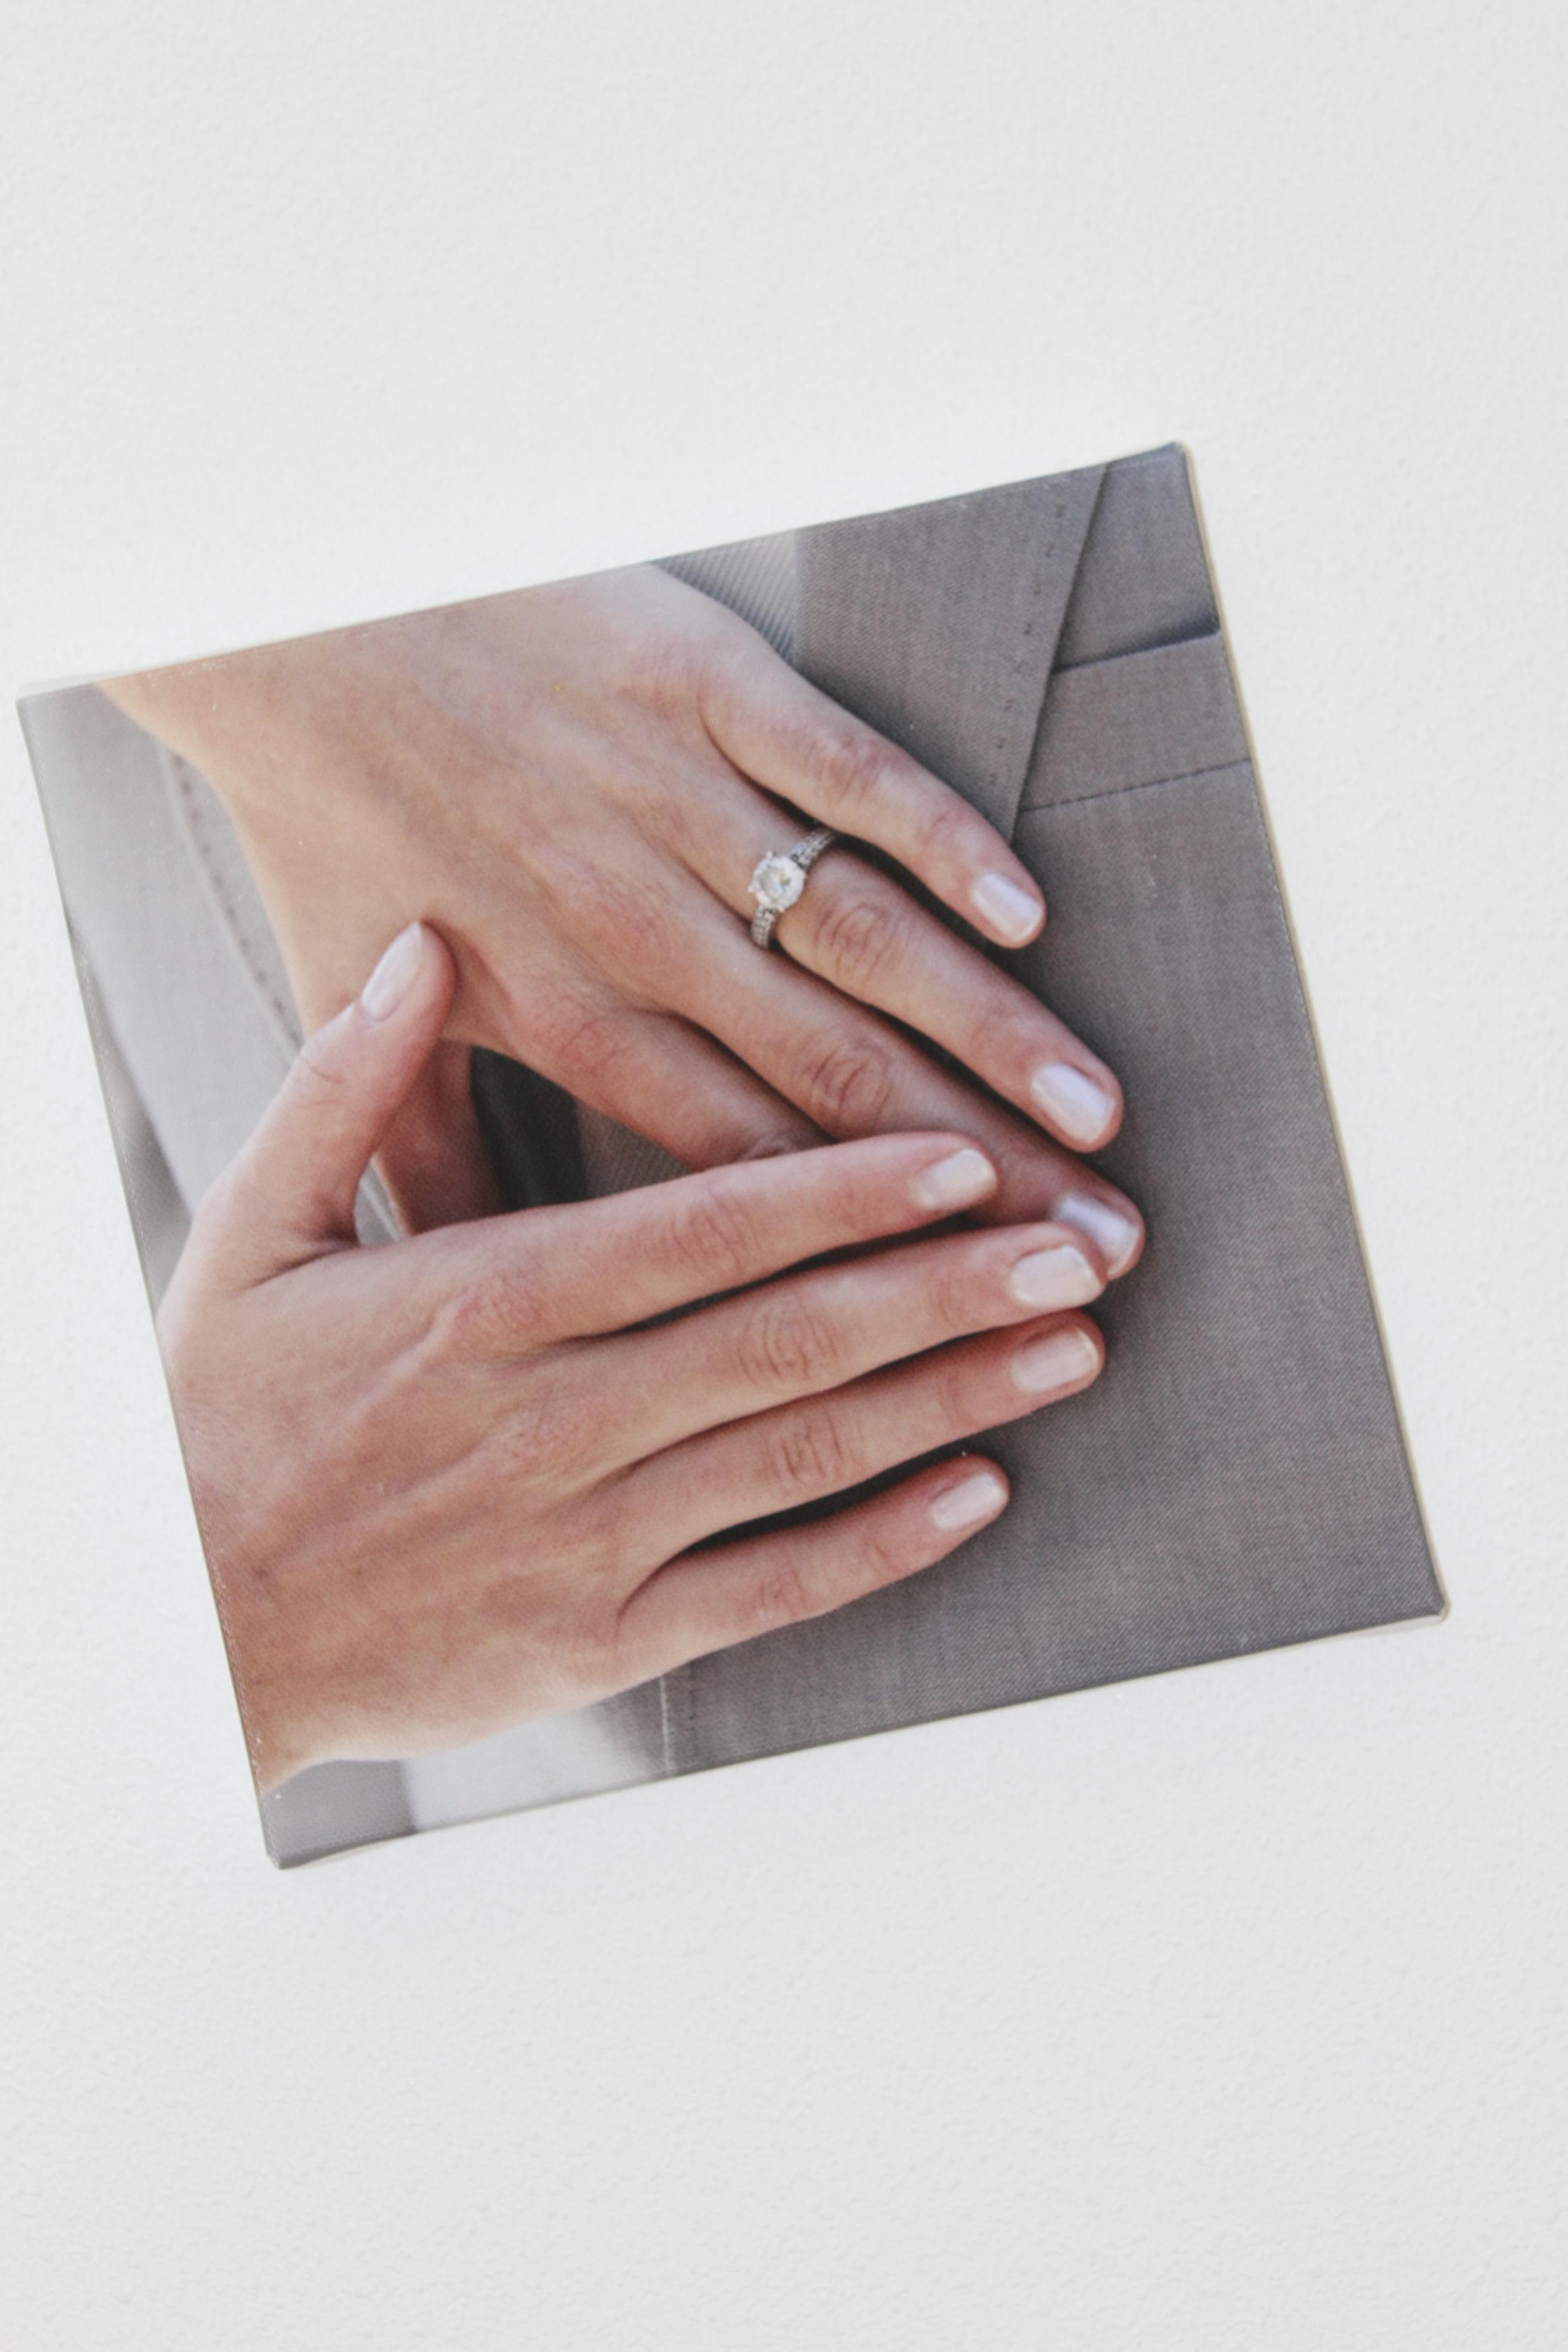 Kuipers_pedicure_manicure_behandeling